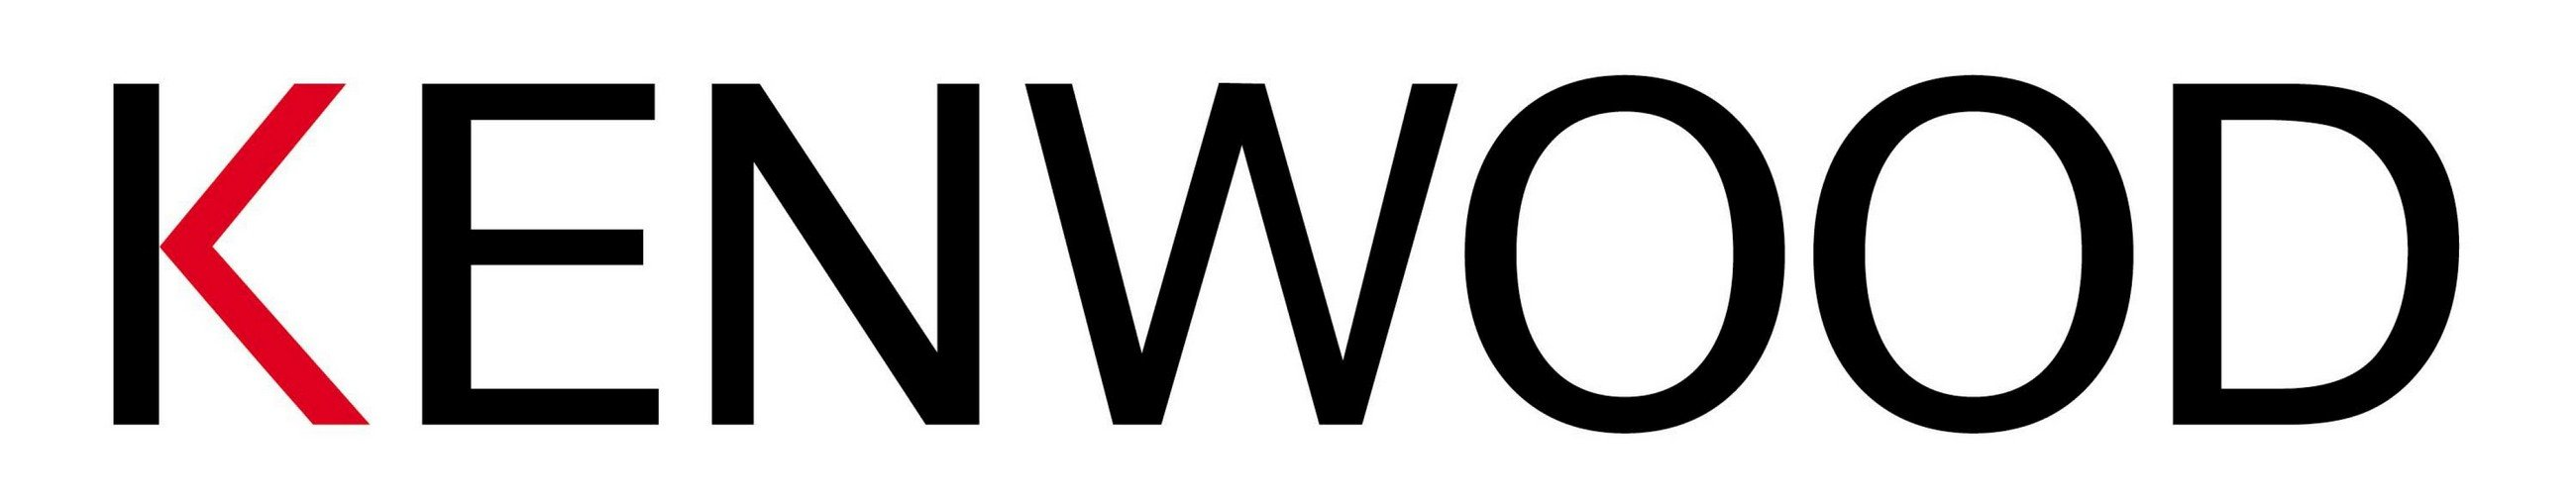 Kenwood logo 2021